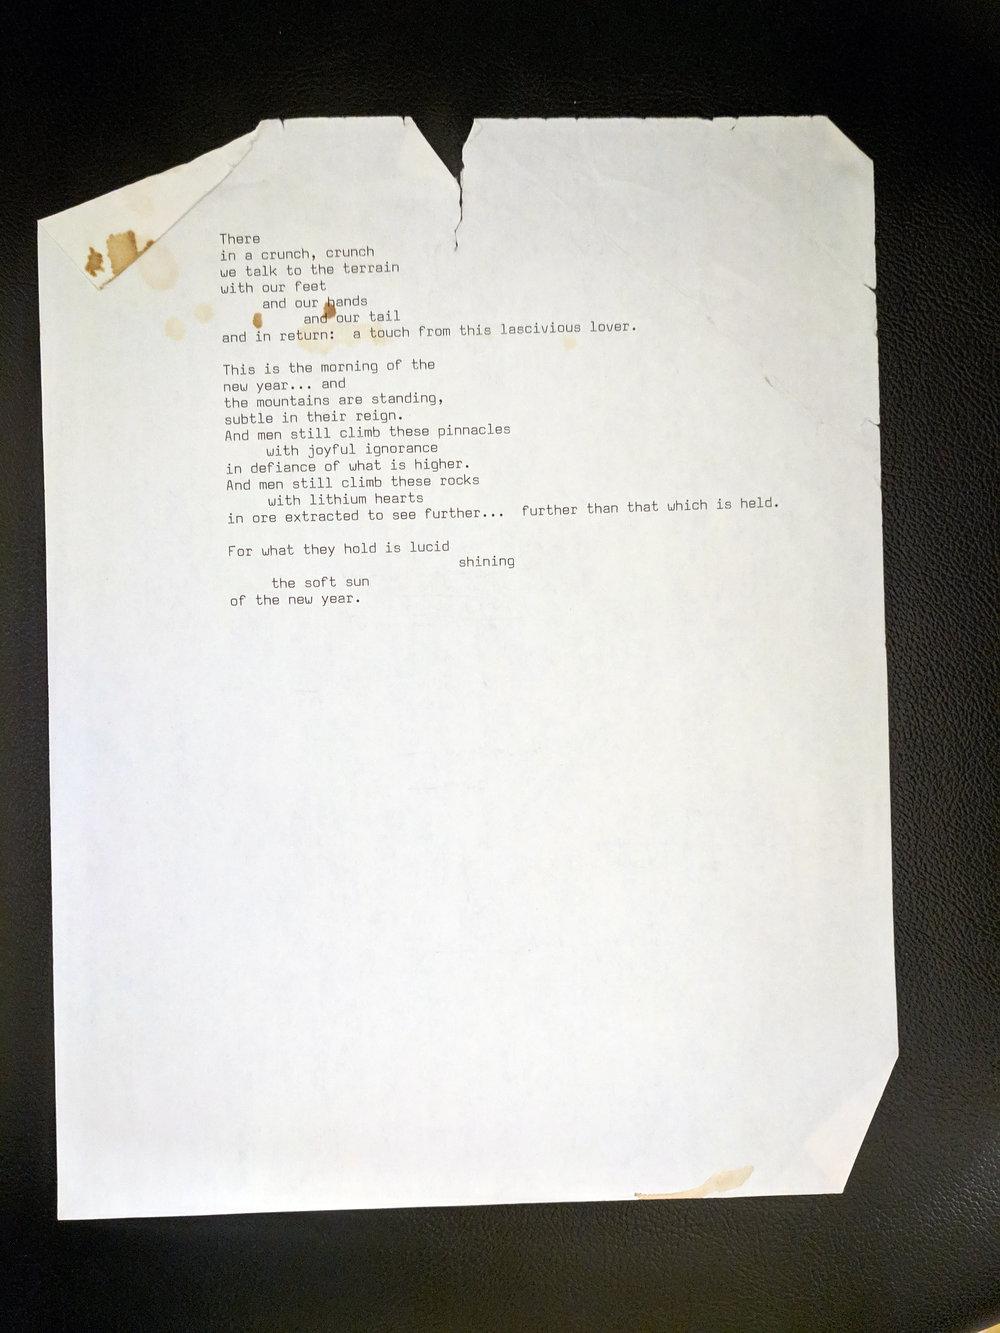 BegBend_NewYear_Poem_02.jpg